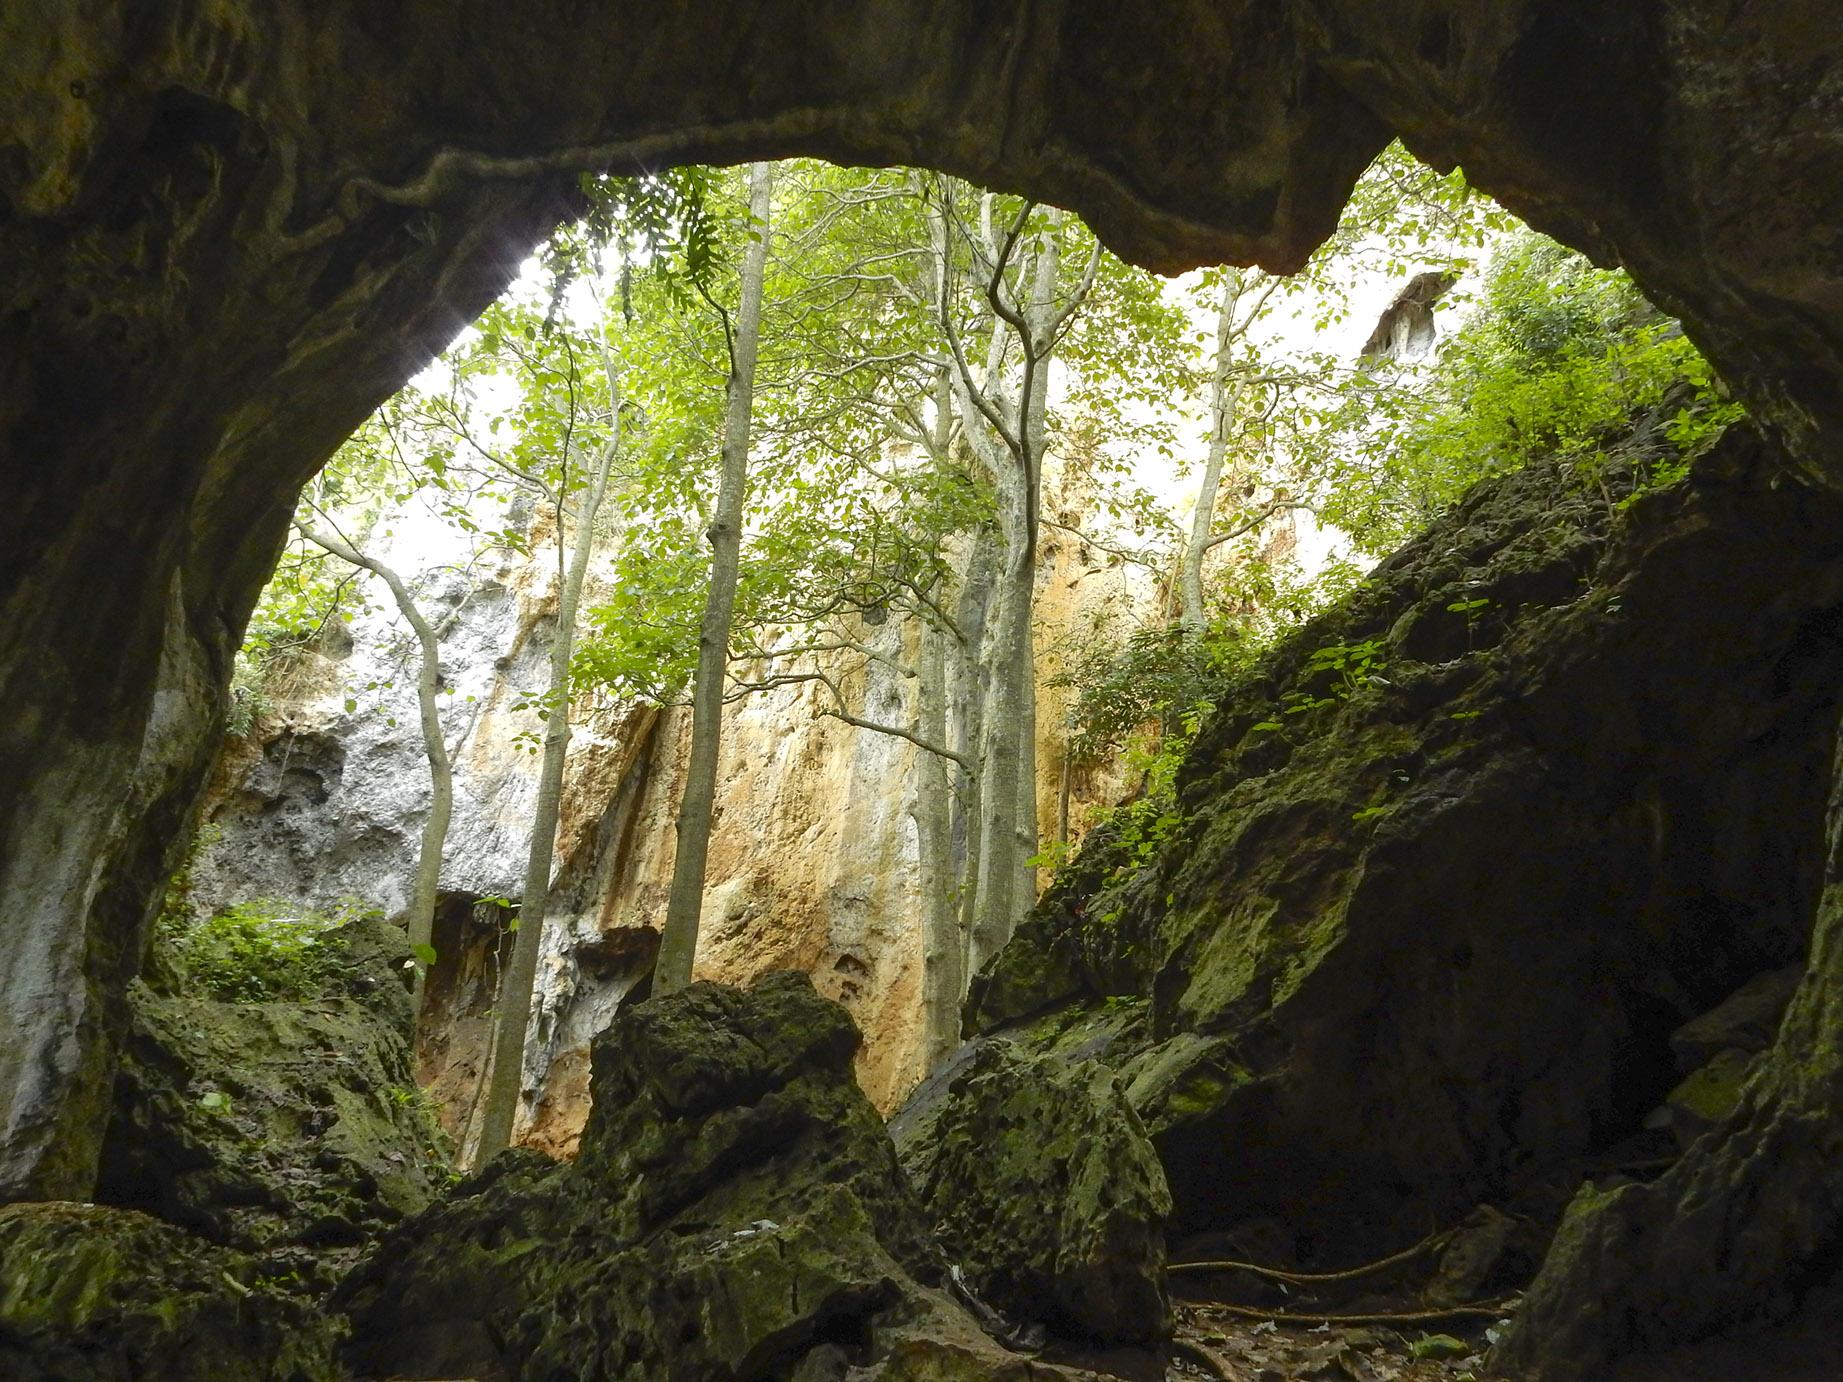 ditemukan fosil manusia purba di goa pawon, bandung barat